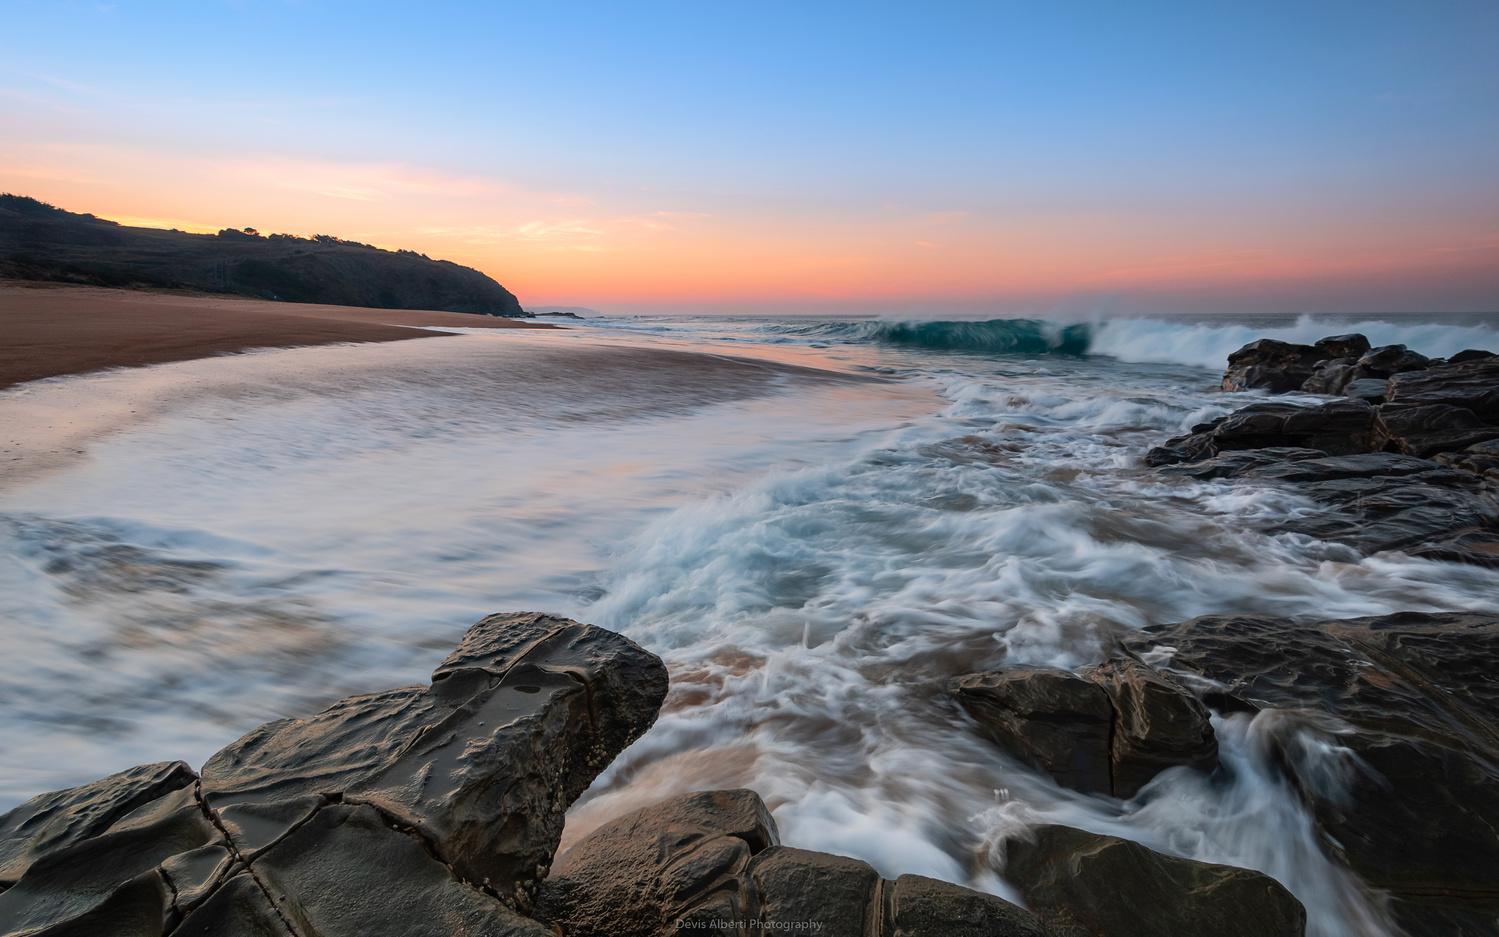 Sunrise by Devis Alberti